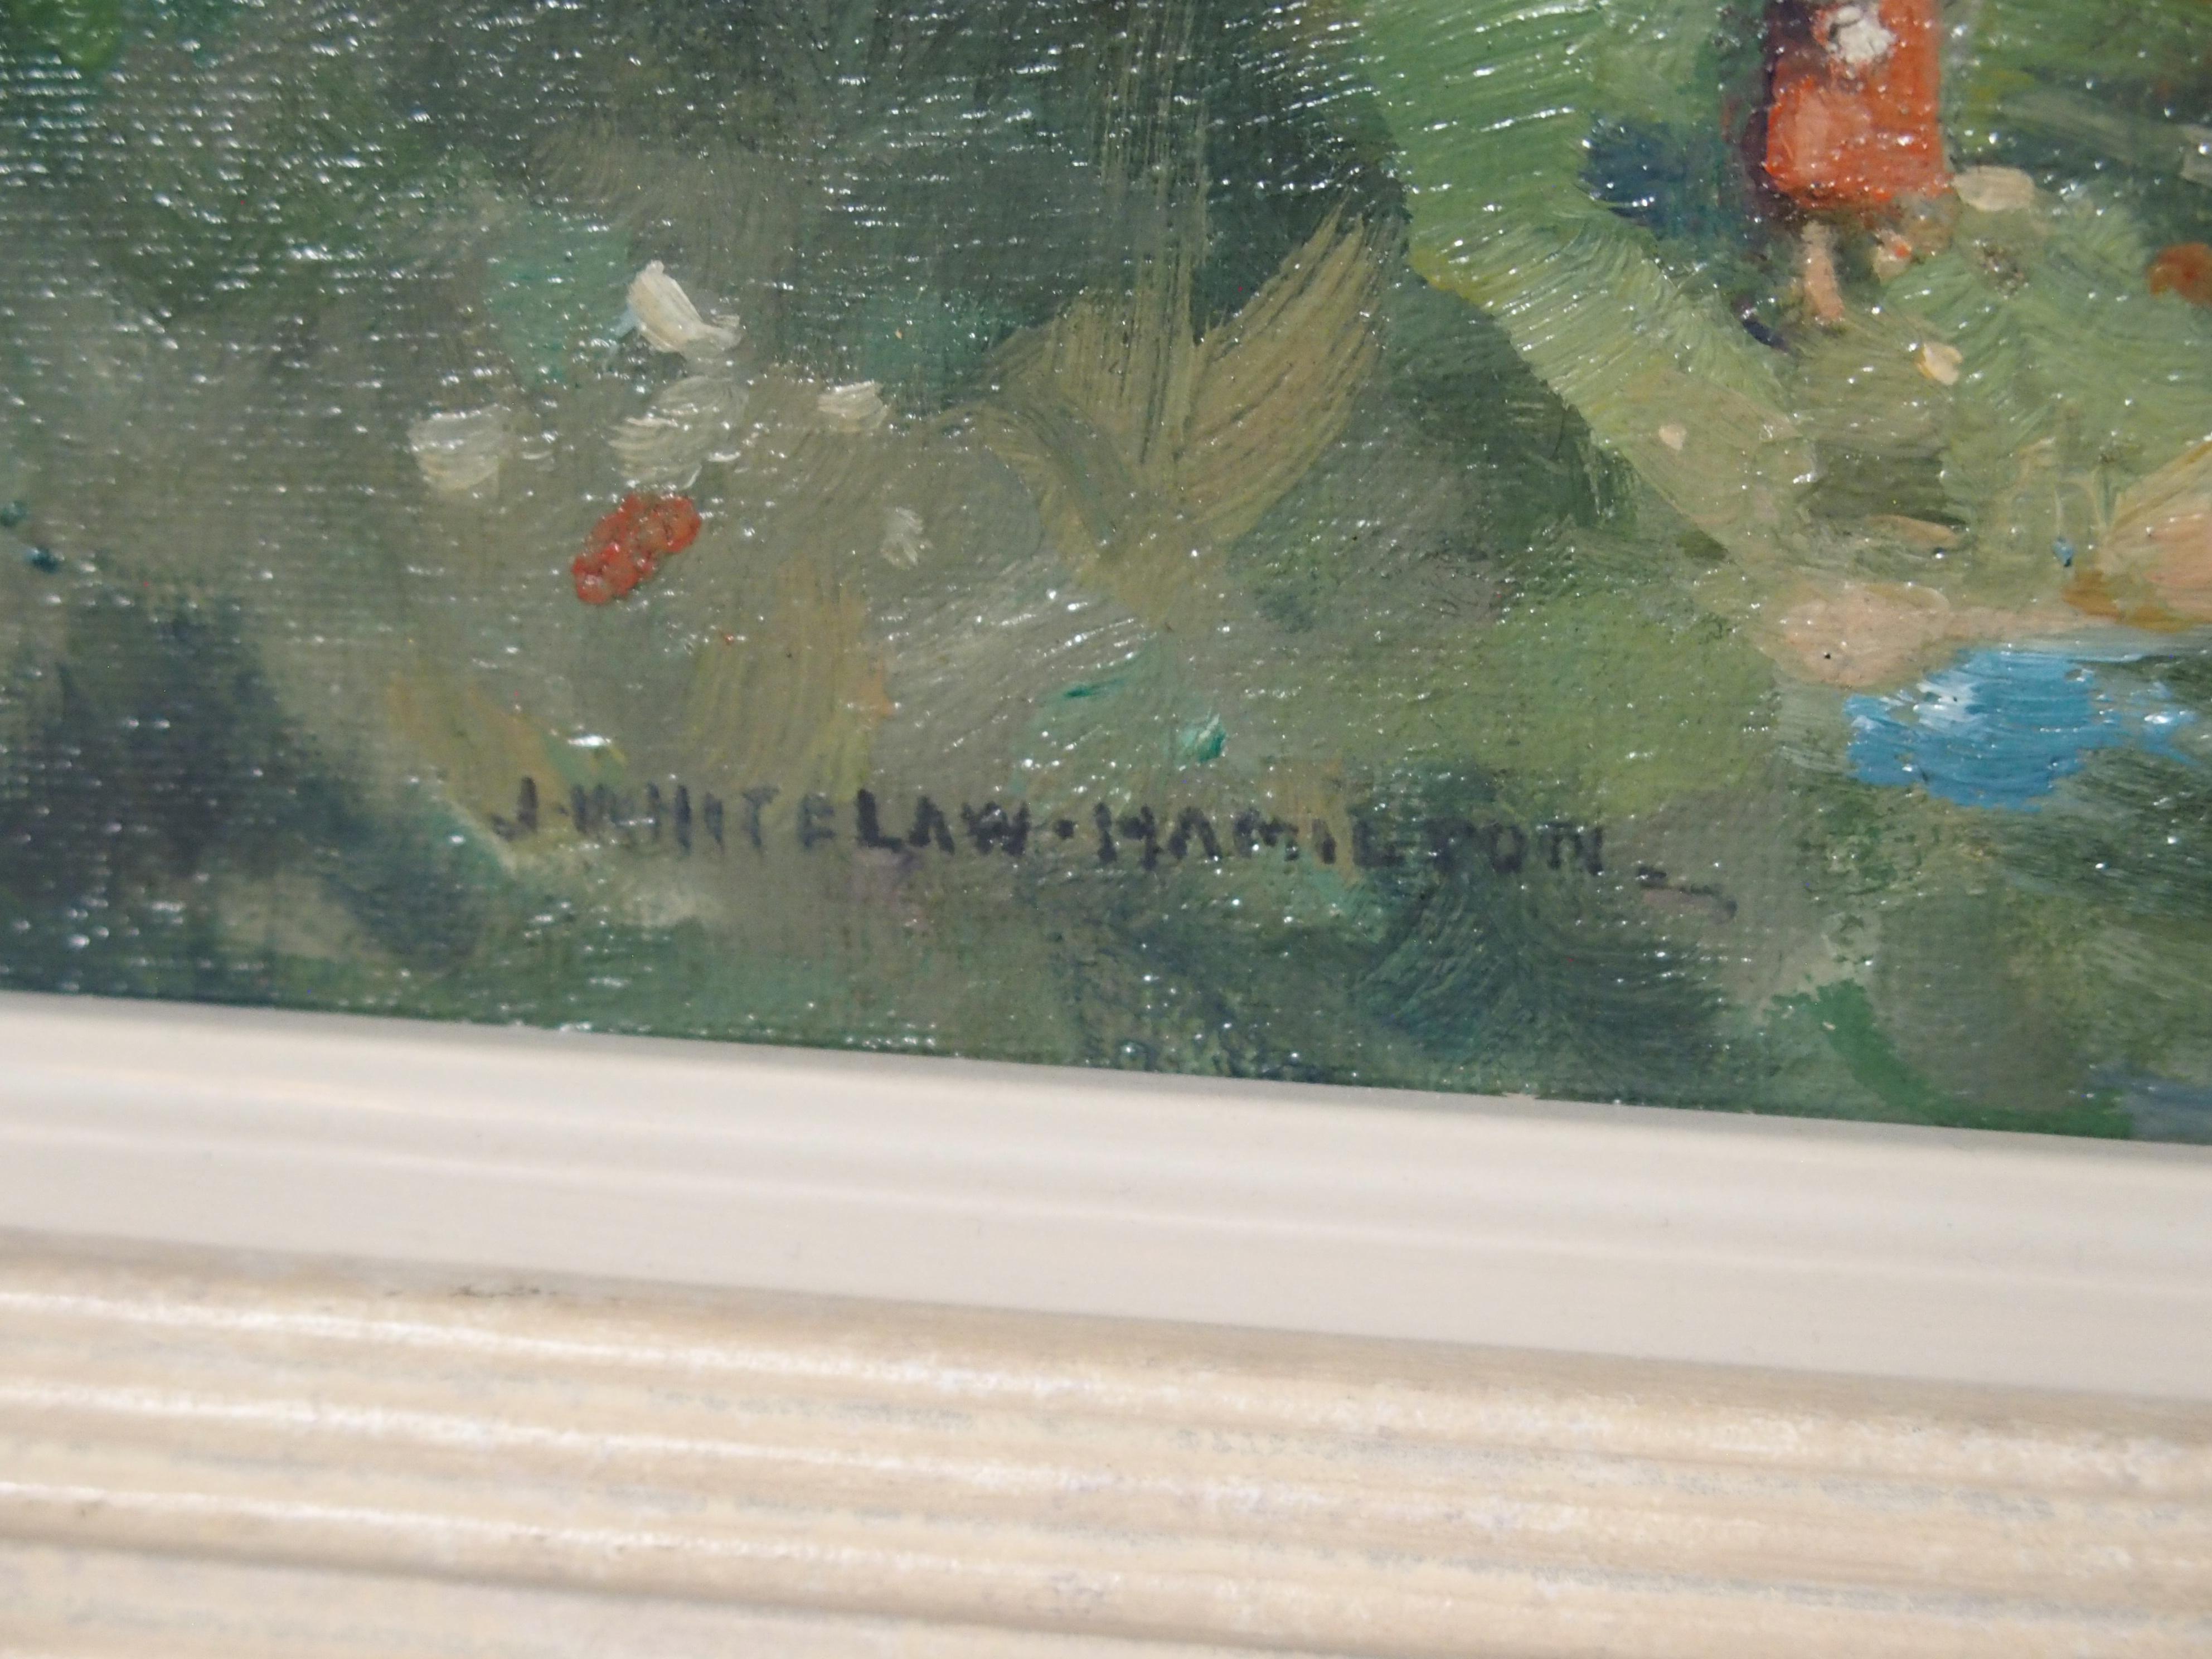 JAMES WHITELAW HAMILTON RSA, RSW (SCOTTISH 1860-1932) SUMMERTIME Oil on canvas board, signed, 23,5 x - Image 3 of 4